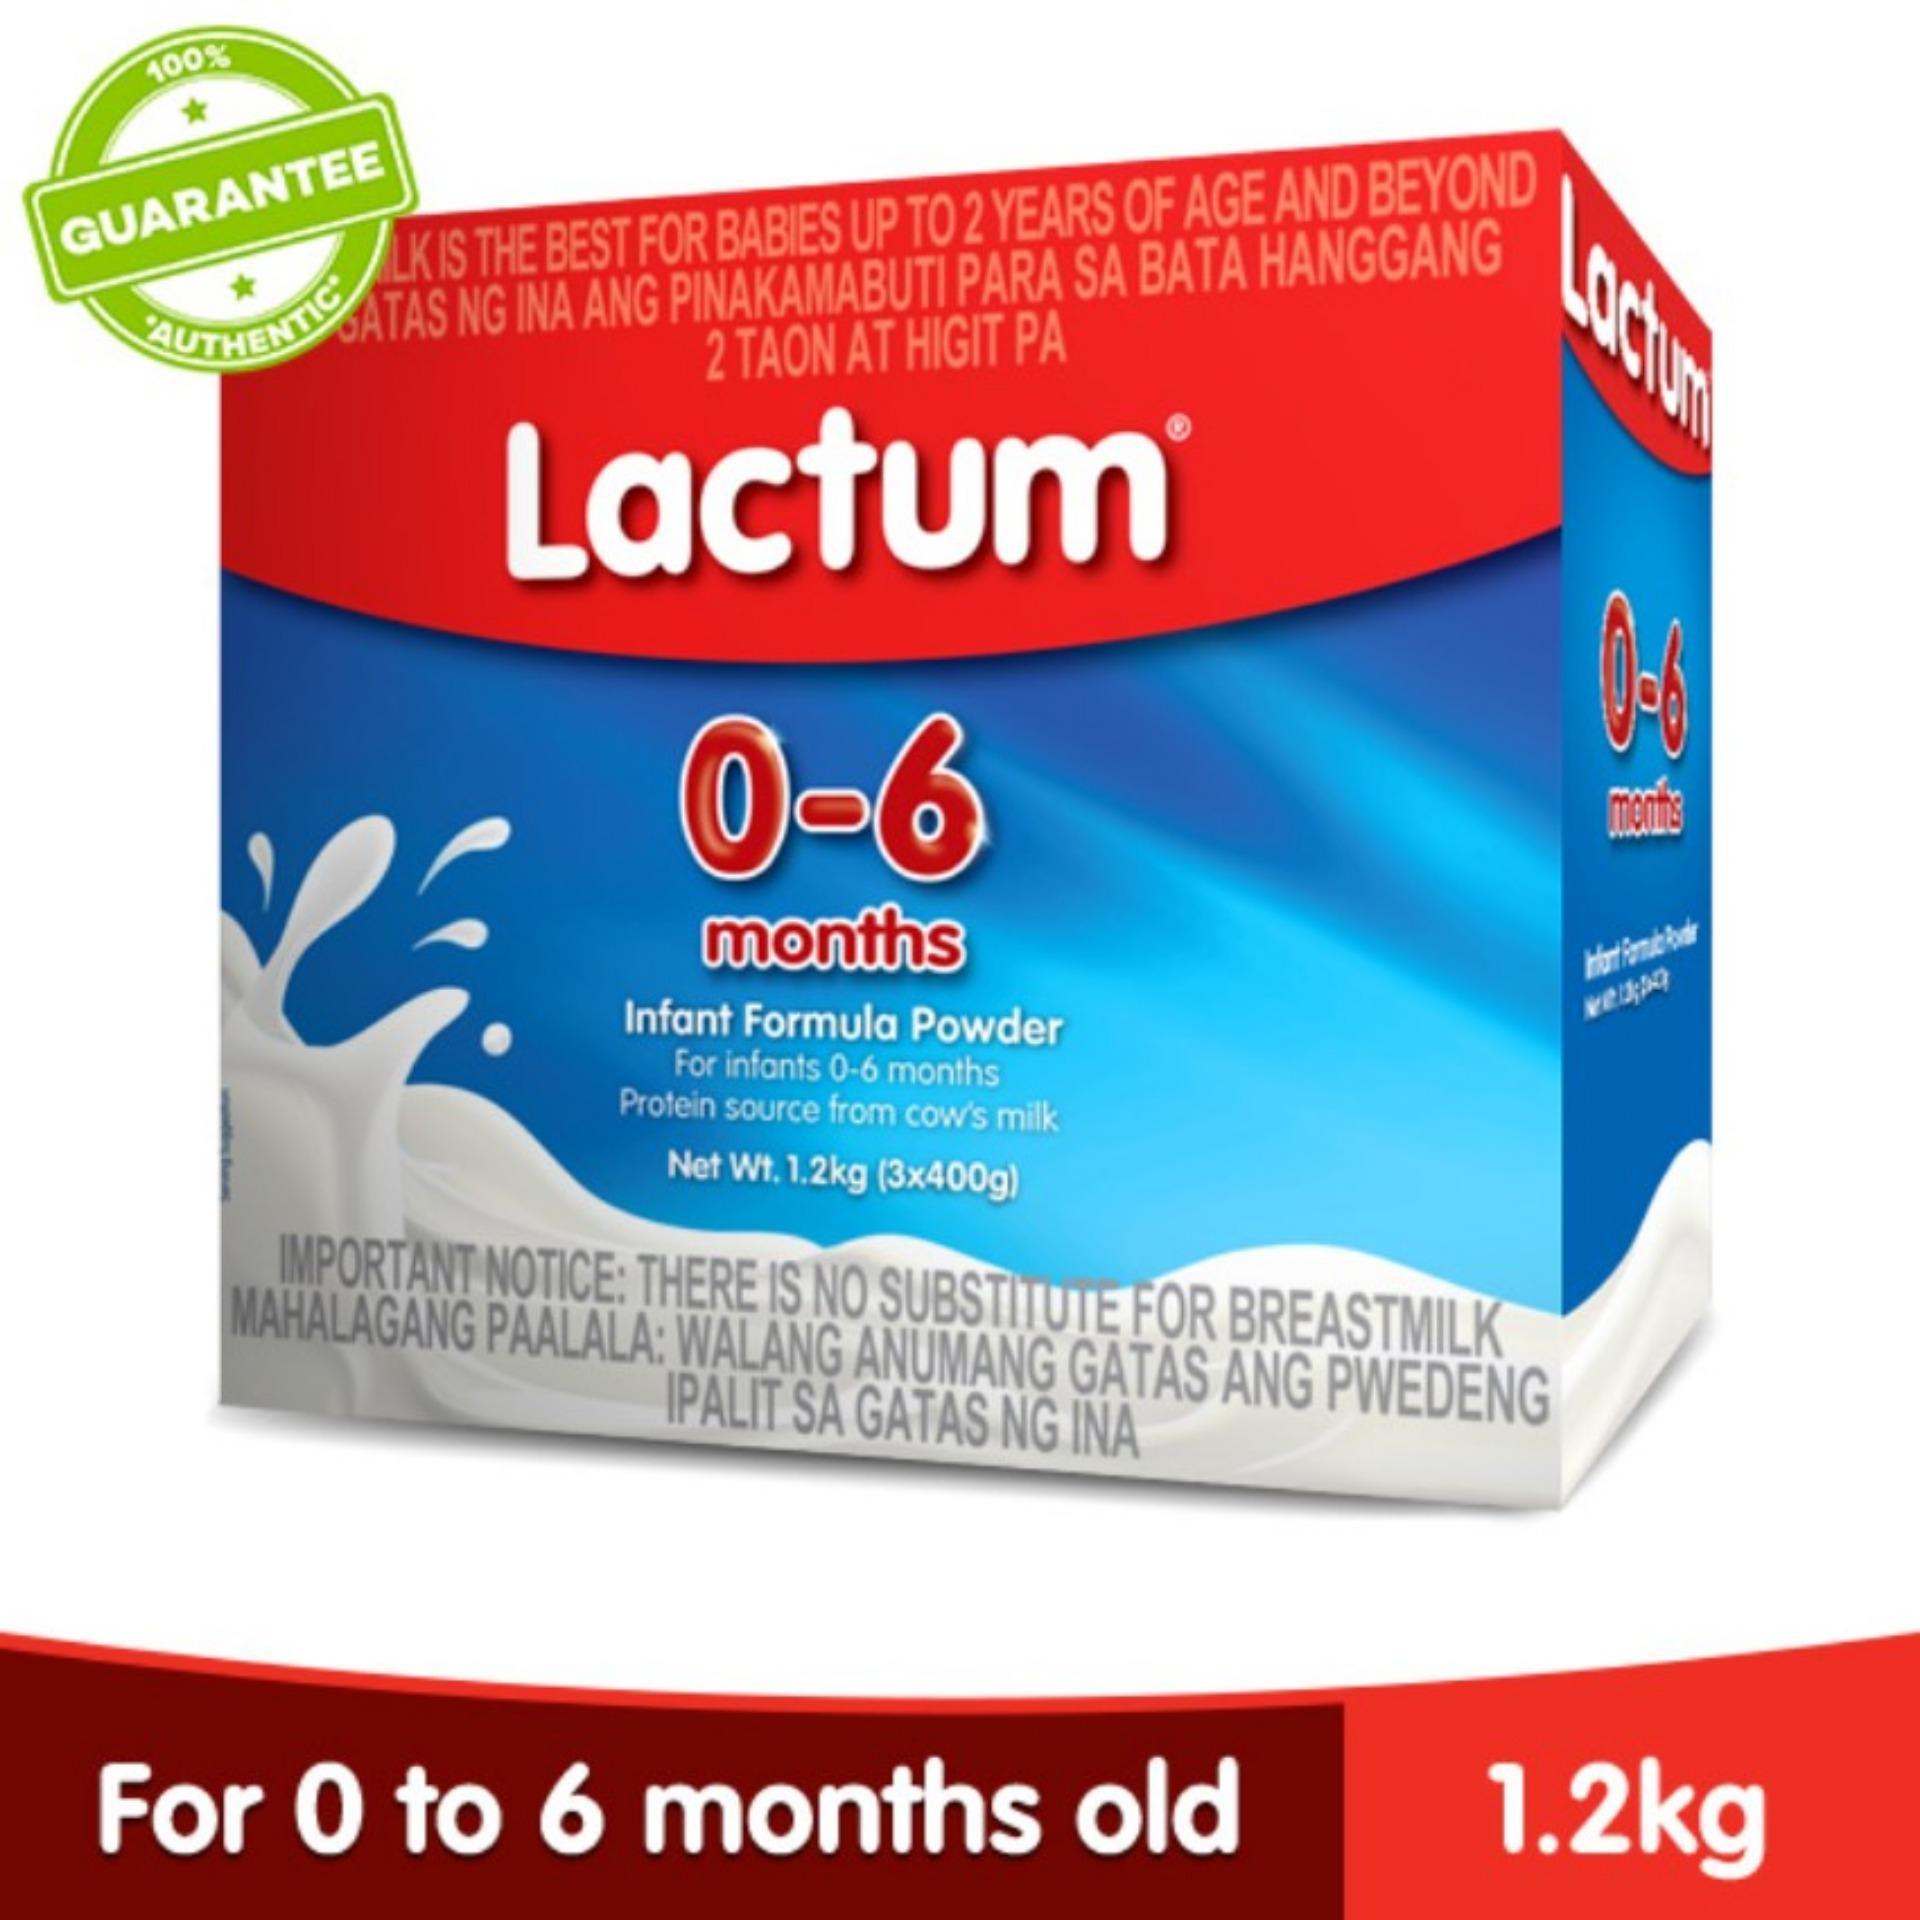 Infant Formula For Sale Baby Online Brands Prices Nan Ph Pro 2 800g Lactum Powder 0 6 Months Old 12kg